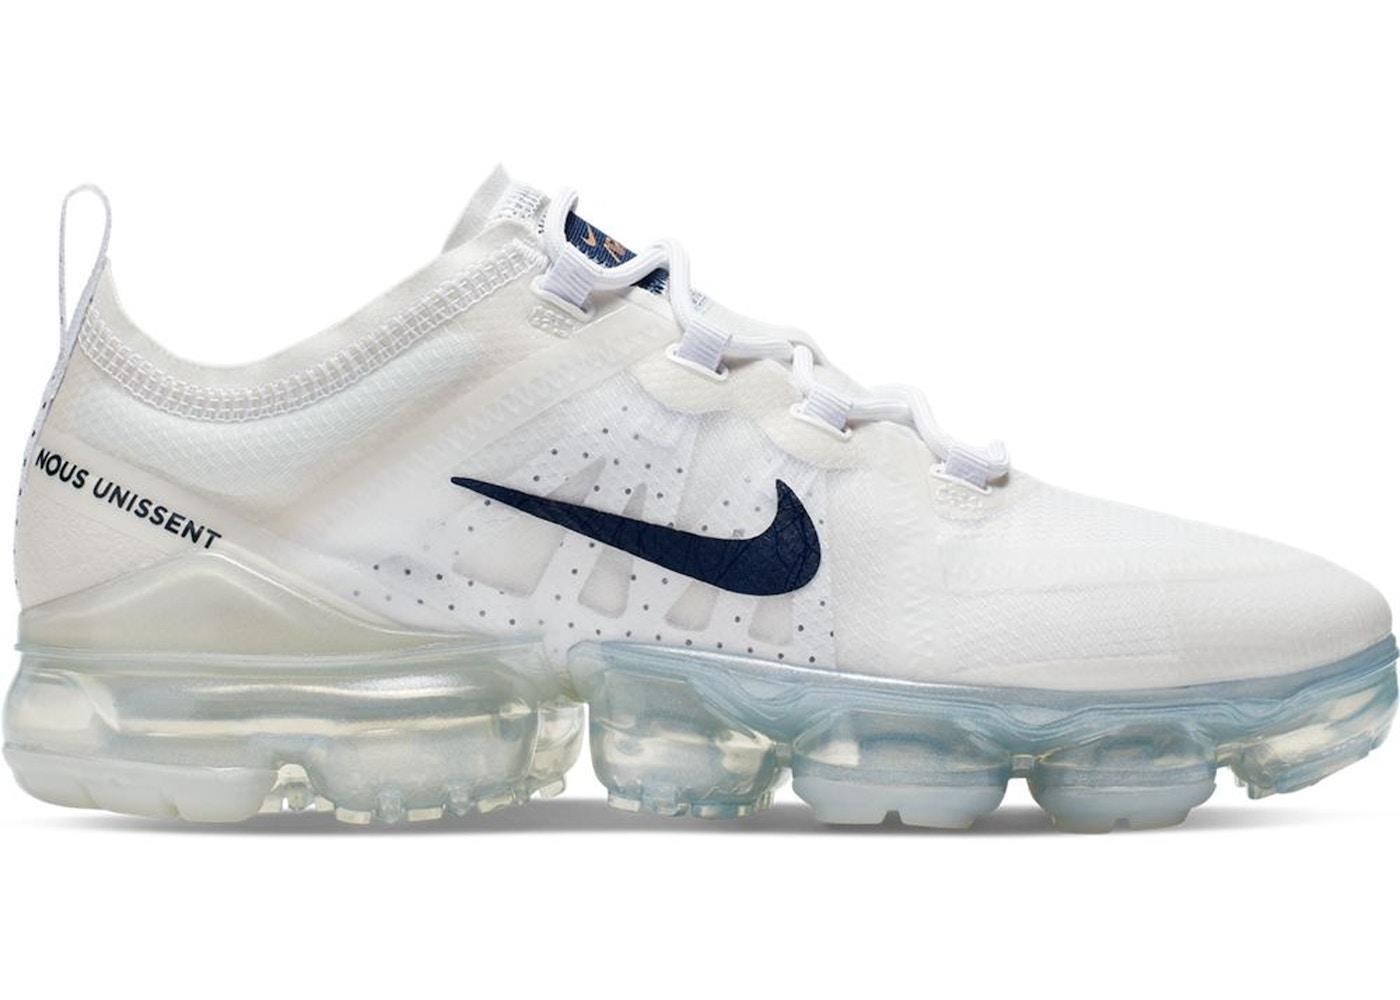 06e3129170e90 Nike Air Max Shoes - Release Date